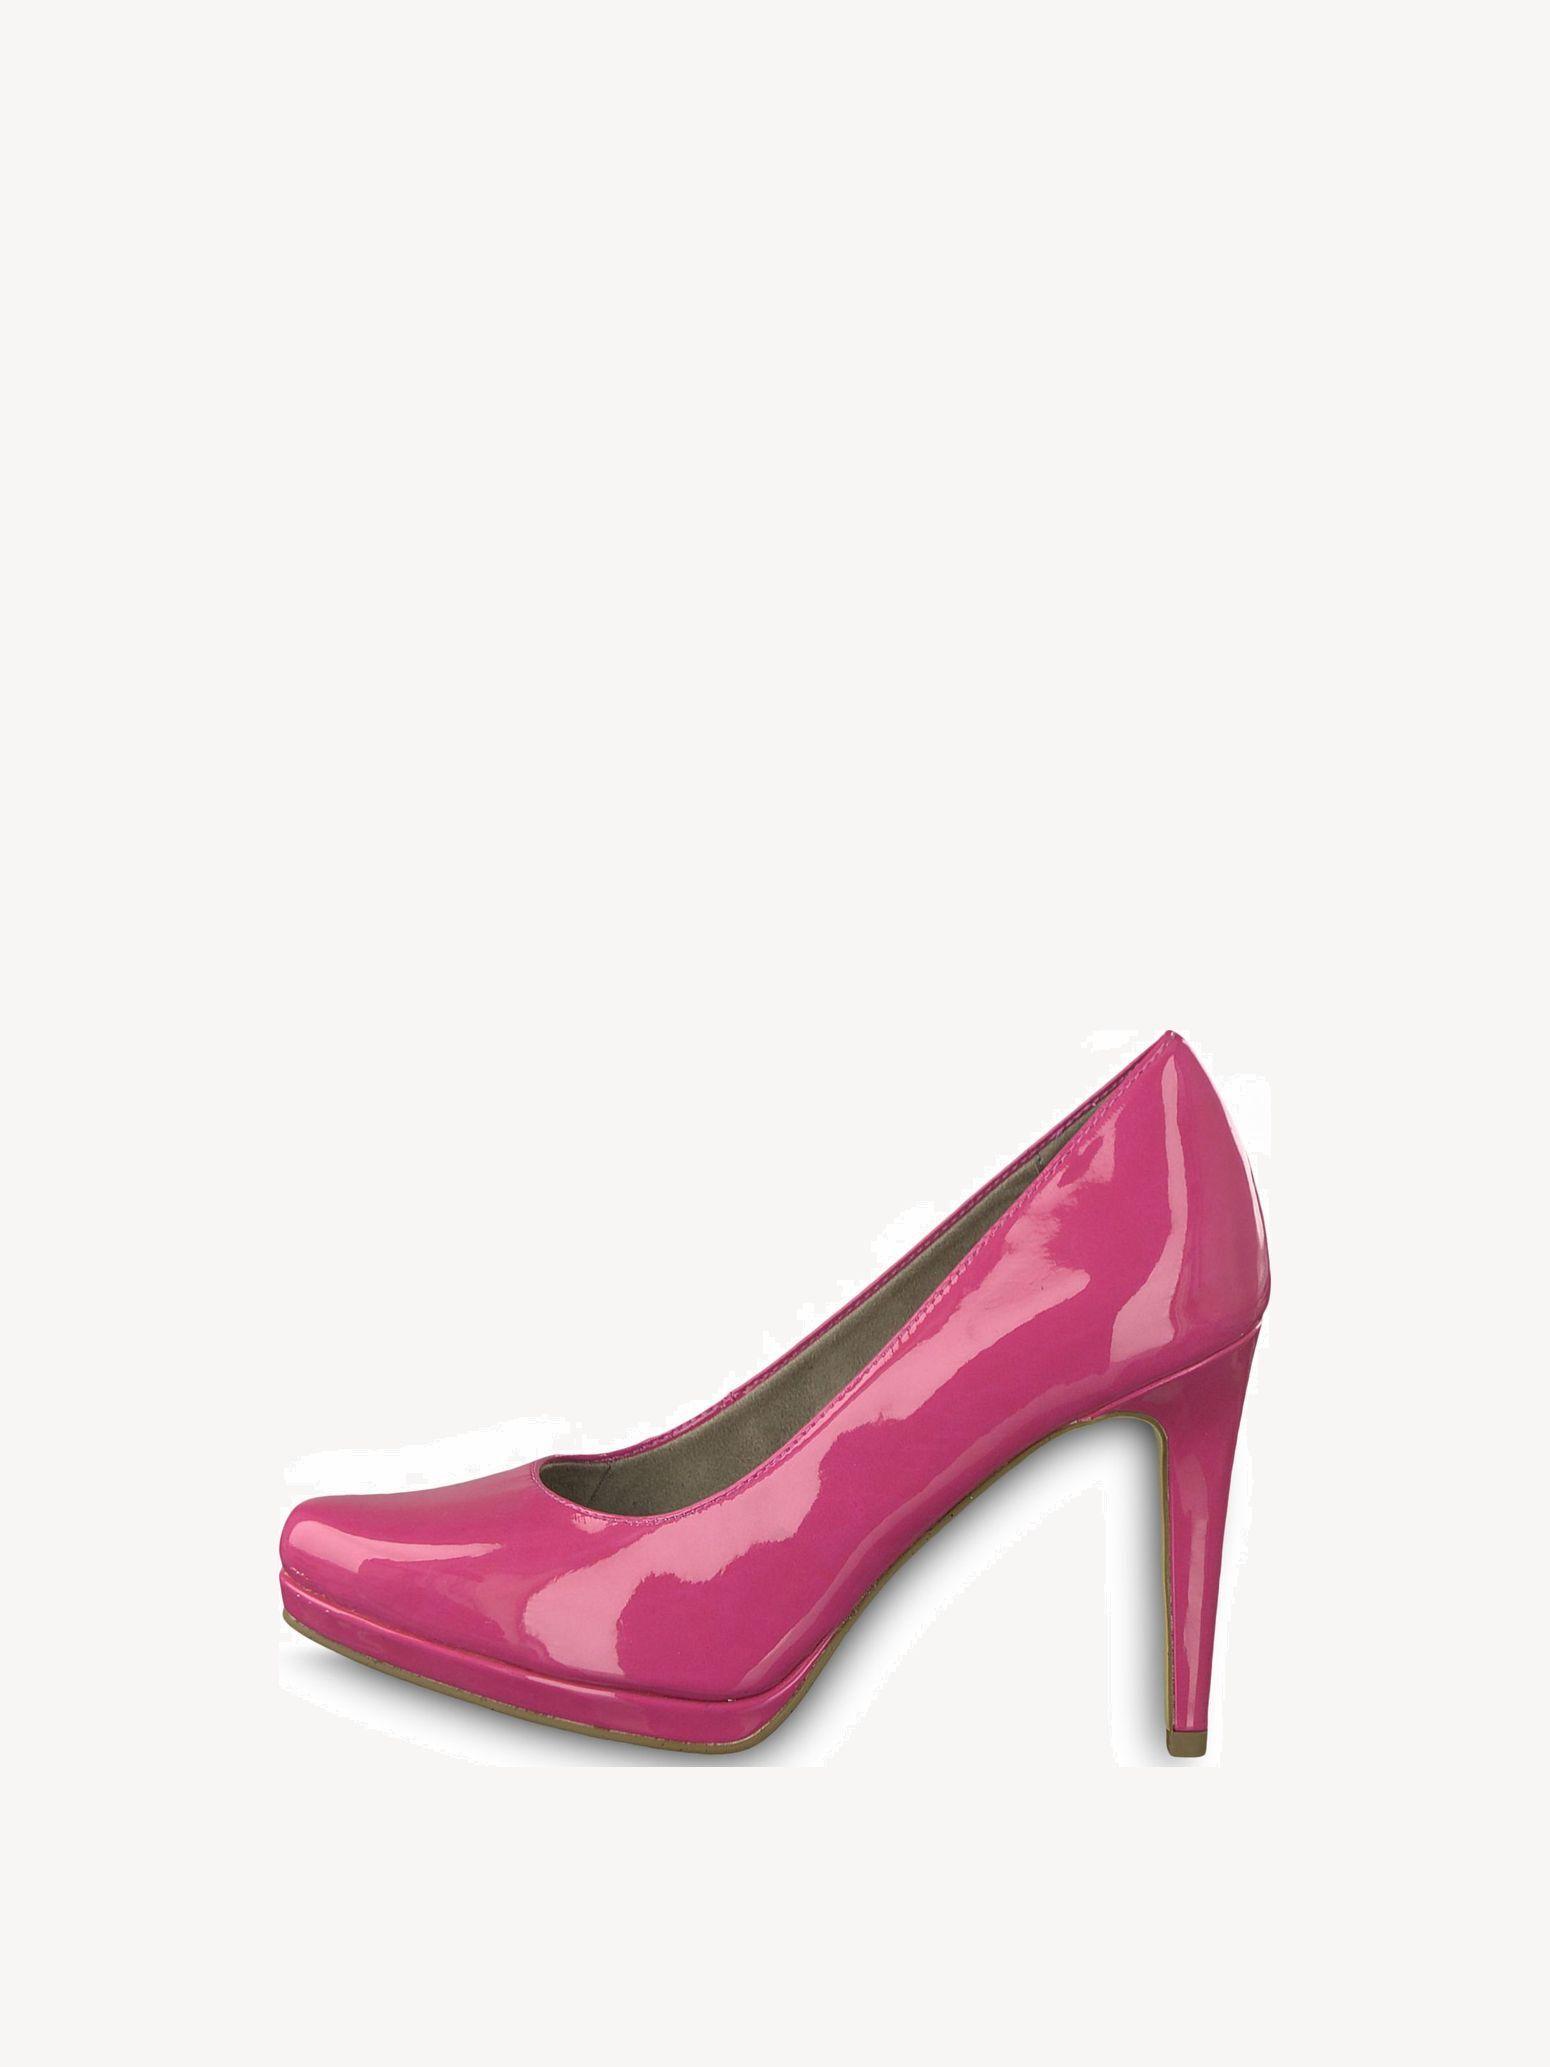 Talons Tamaris chaussures hauts Talons Tamaris femmes Talons femmes chaussures hauts 06qwEf